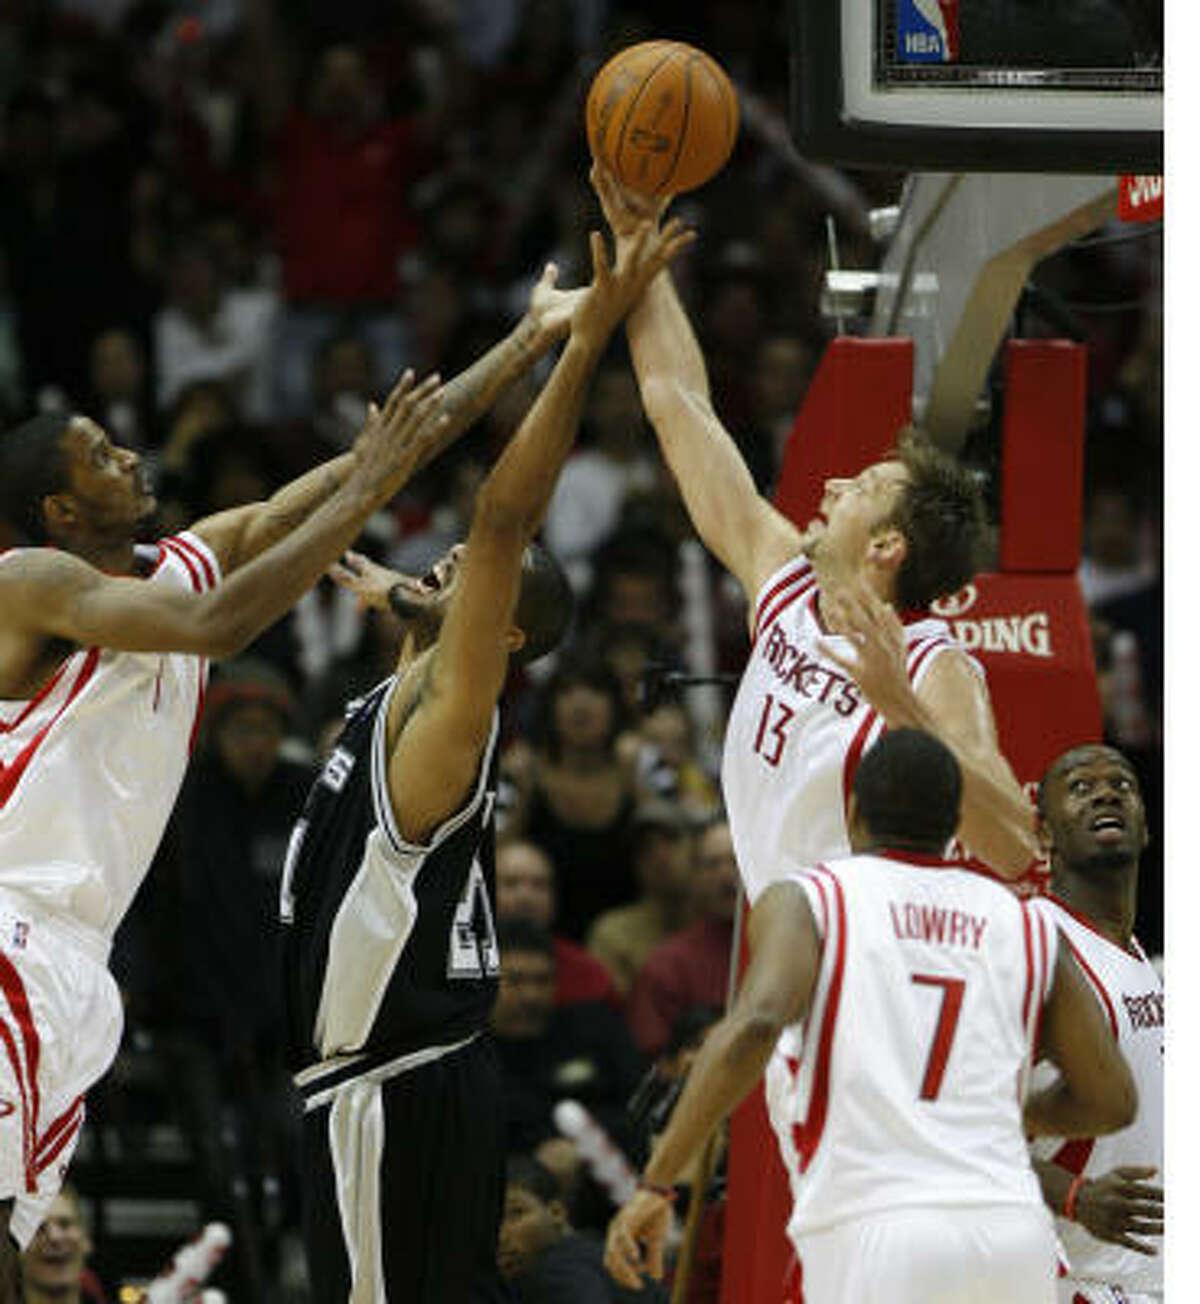 Rockets forward Trevor Ariza, left, and center David Andersen (13) battle for a rebound against Spurs center Tim Duncan during the second half.